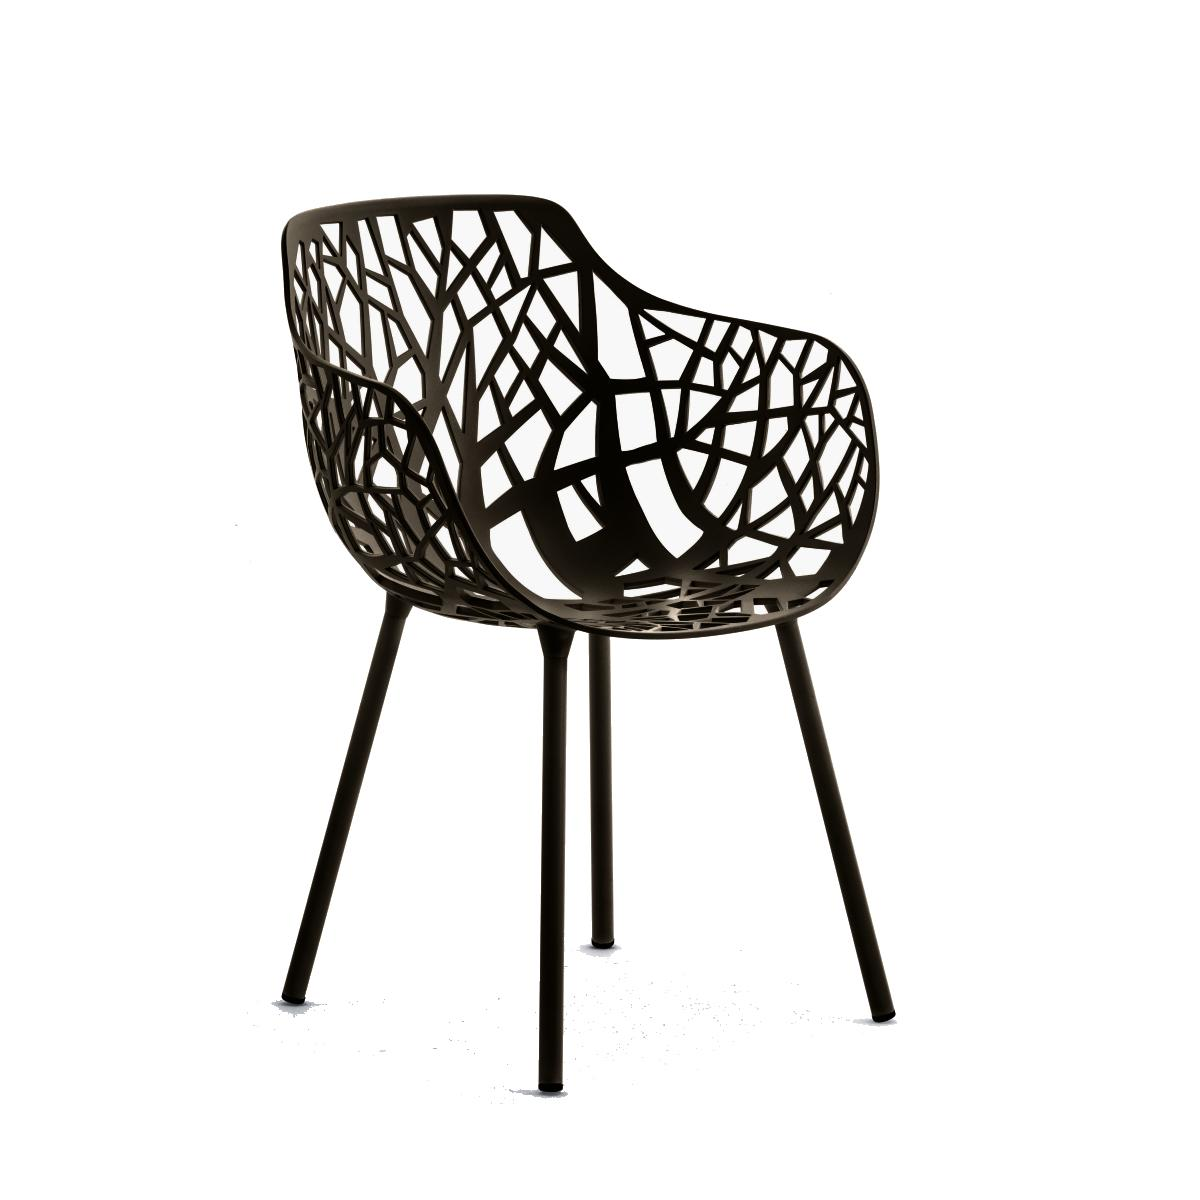 FOREST Sessel Aluminium schwarz